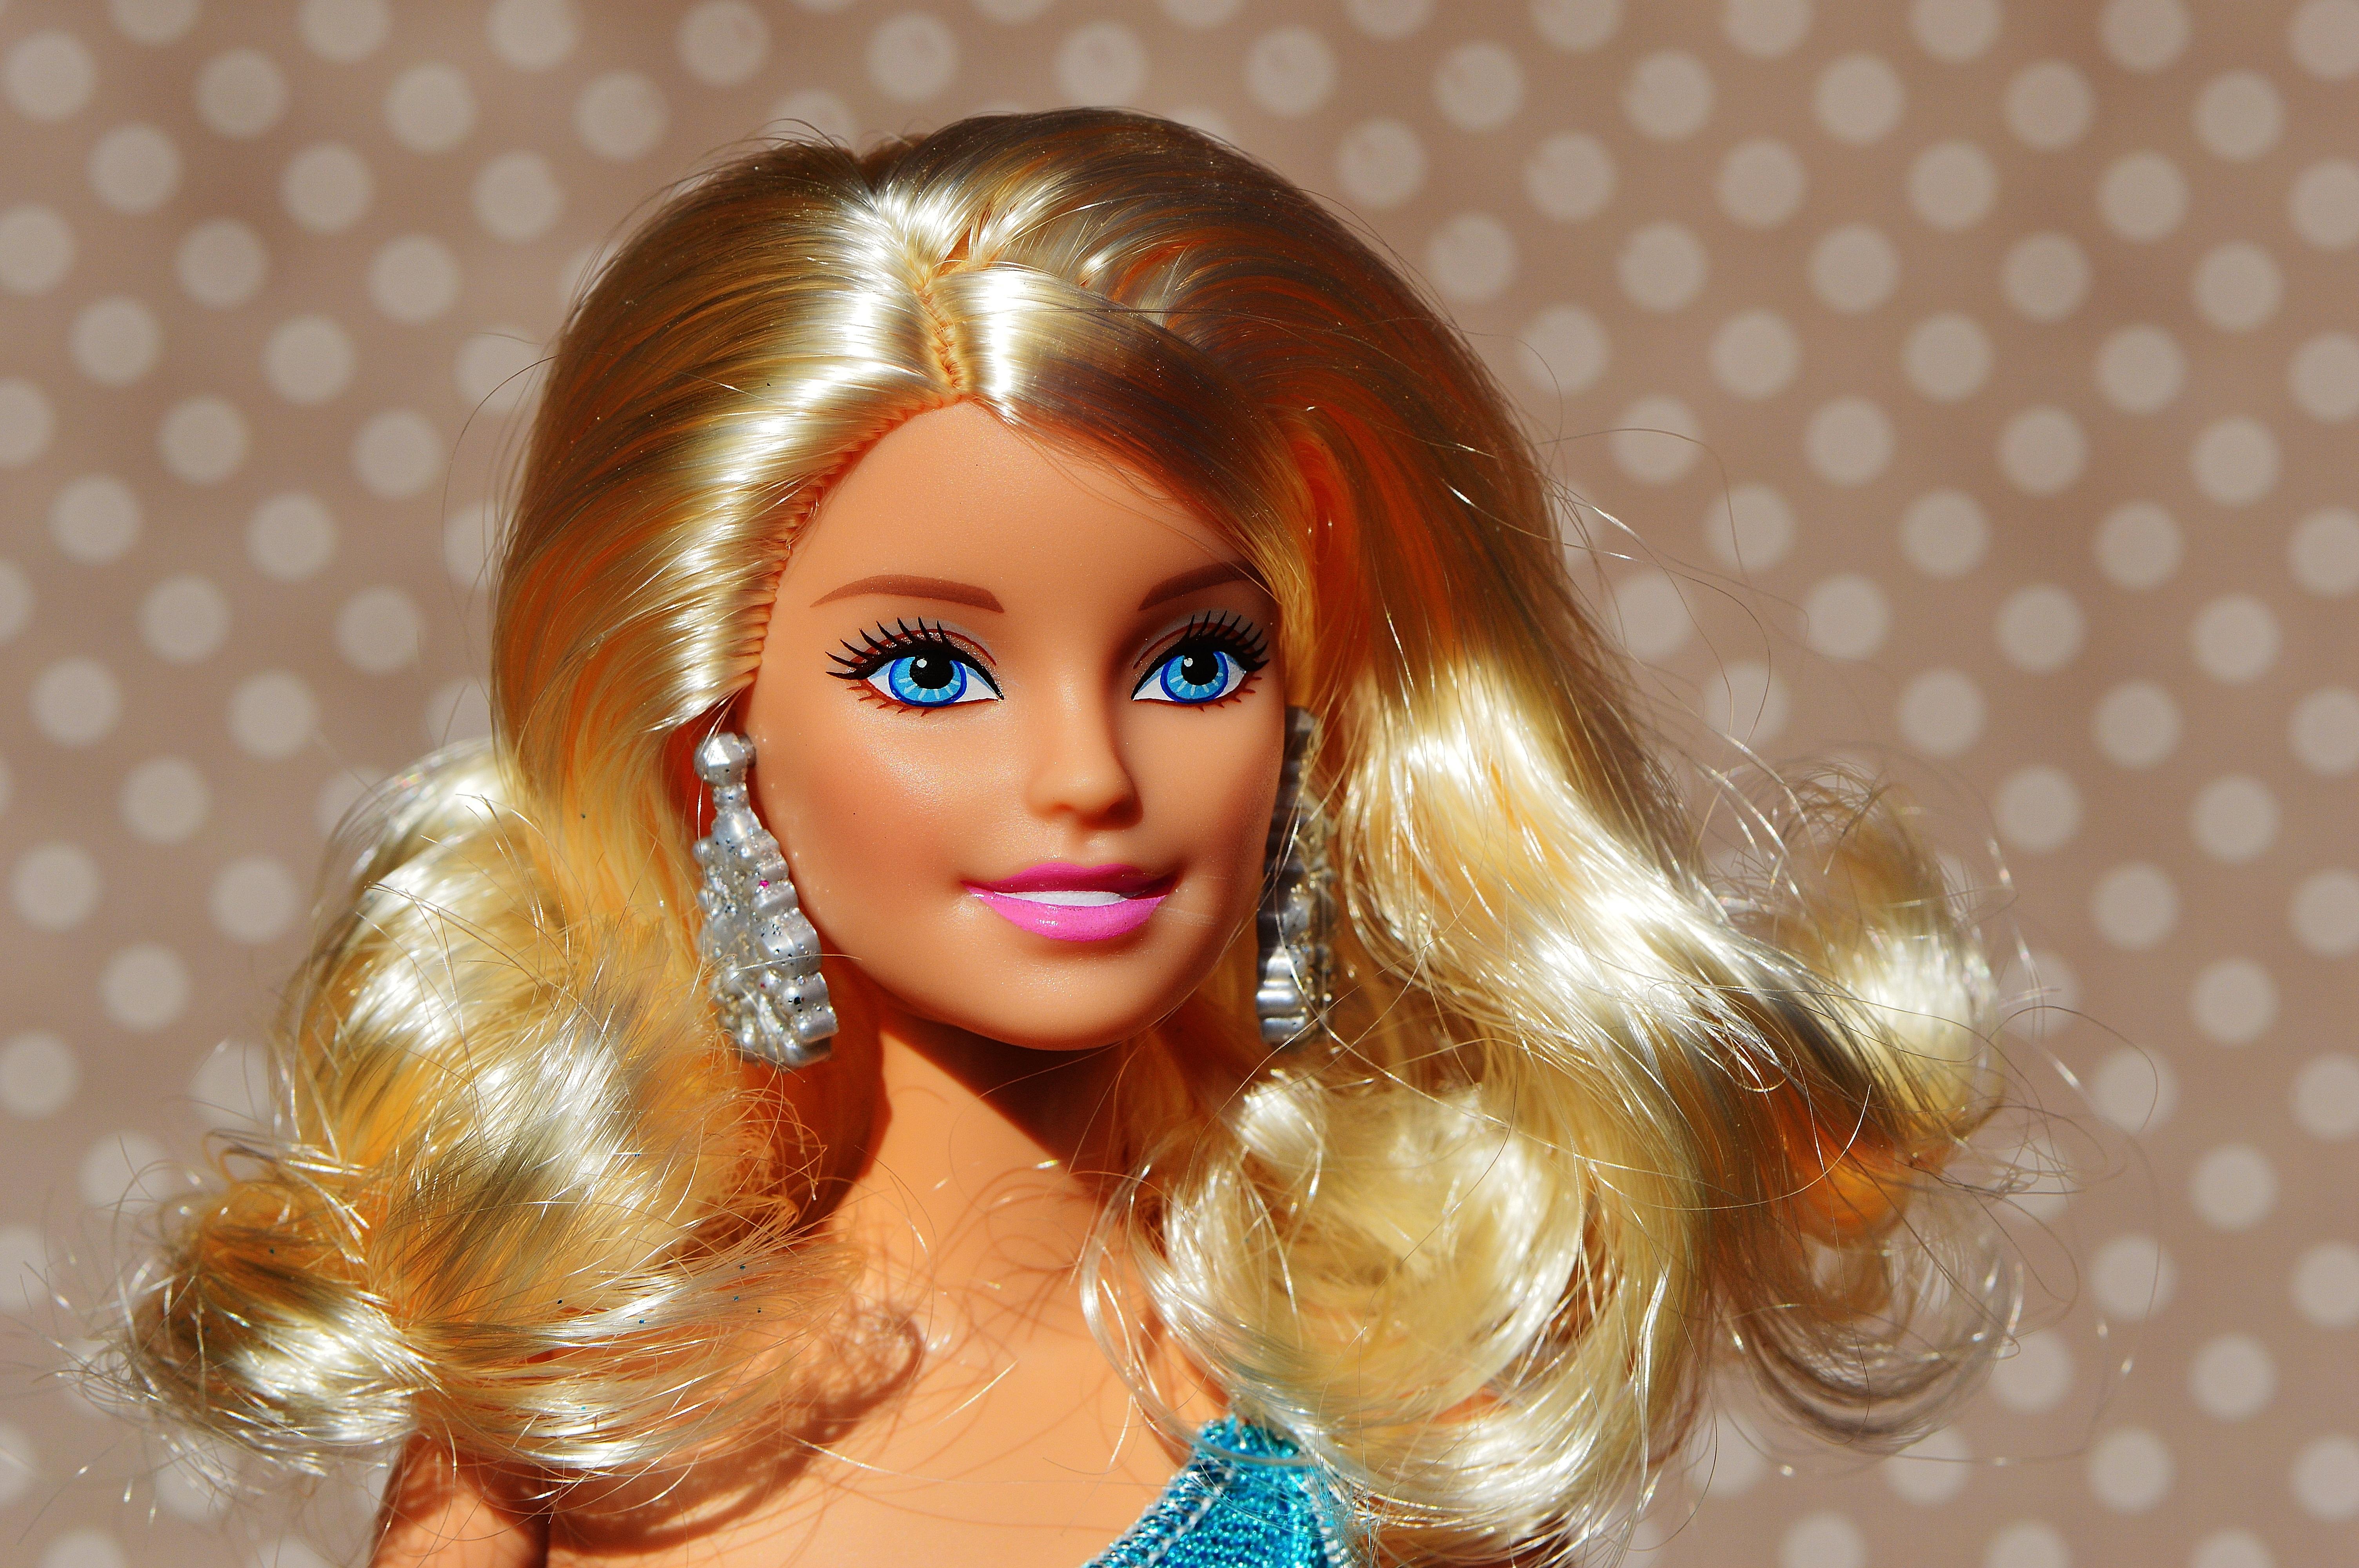 Joue de fille de coiffure